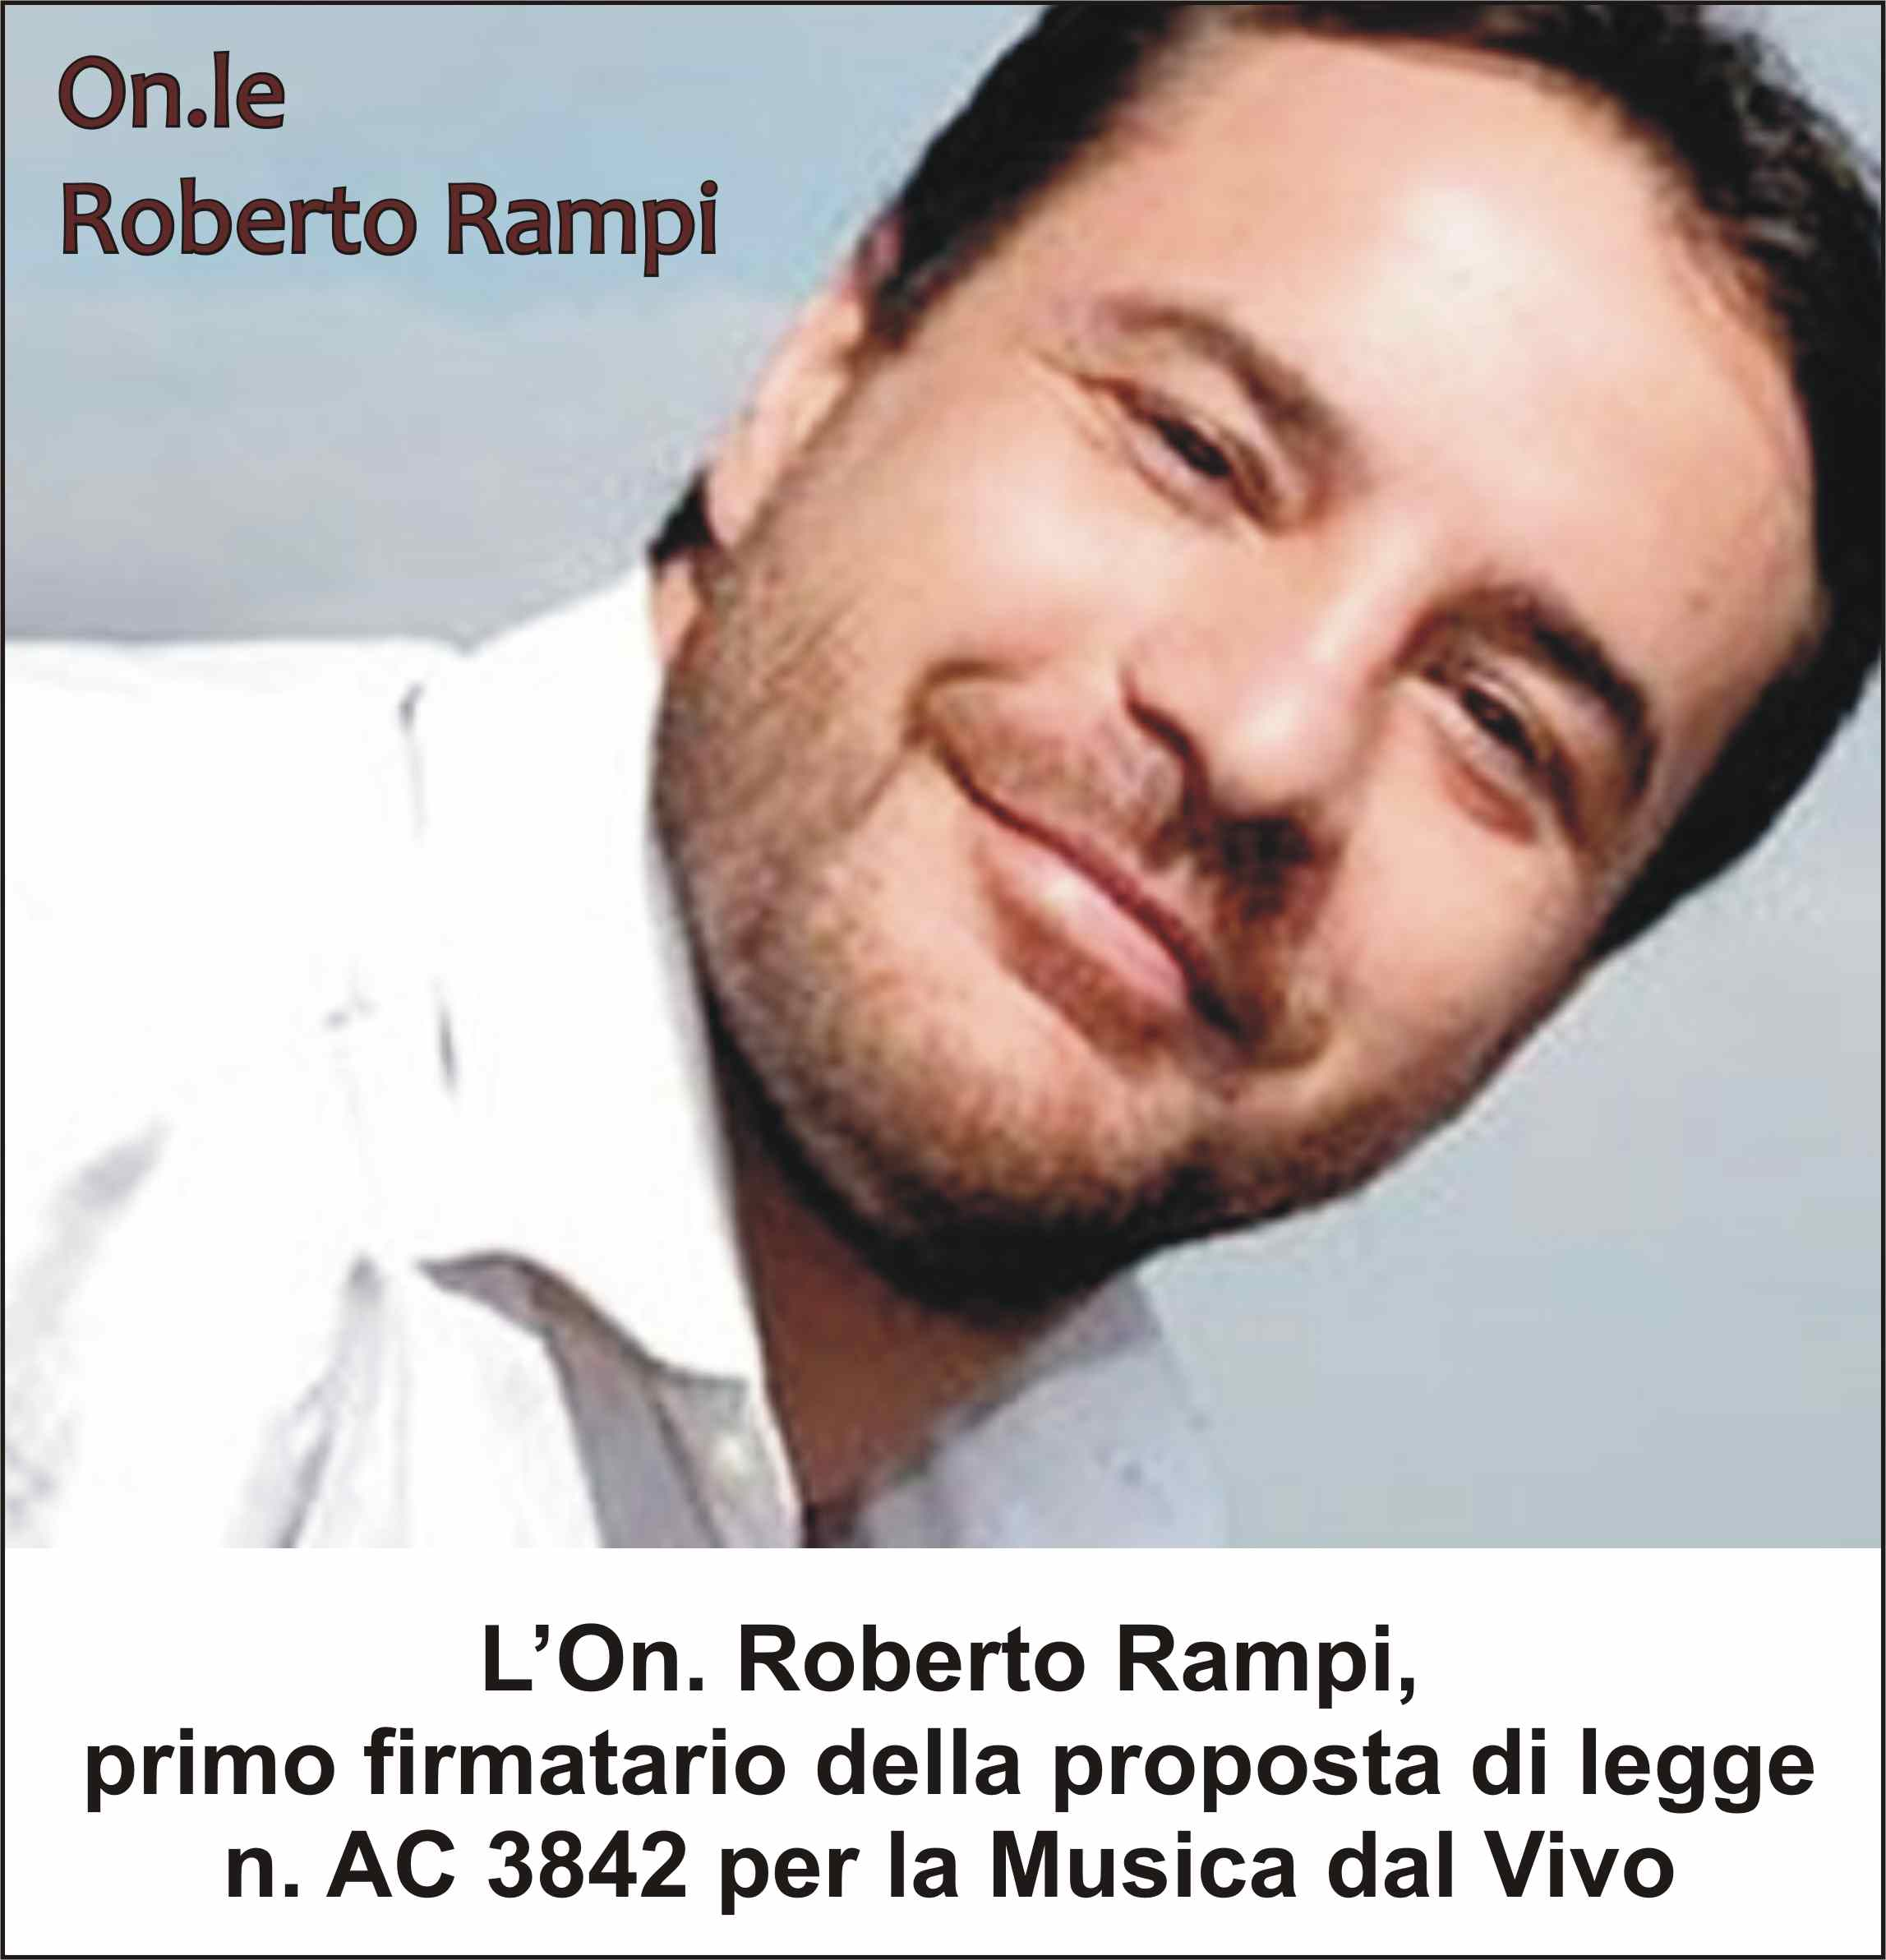 Roberto Rampi